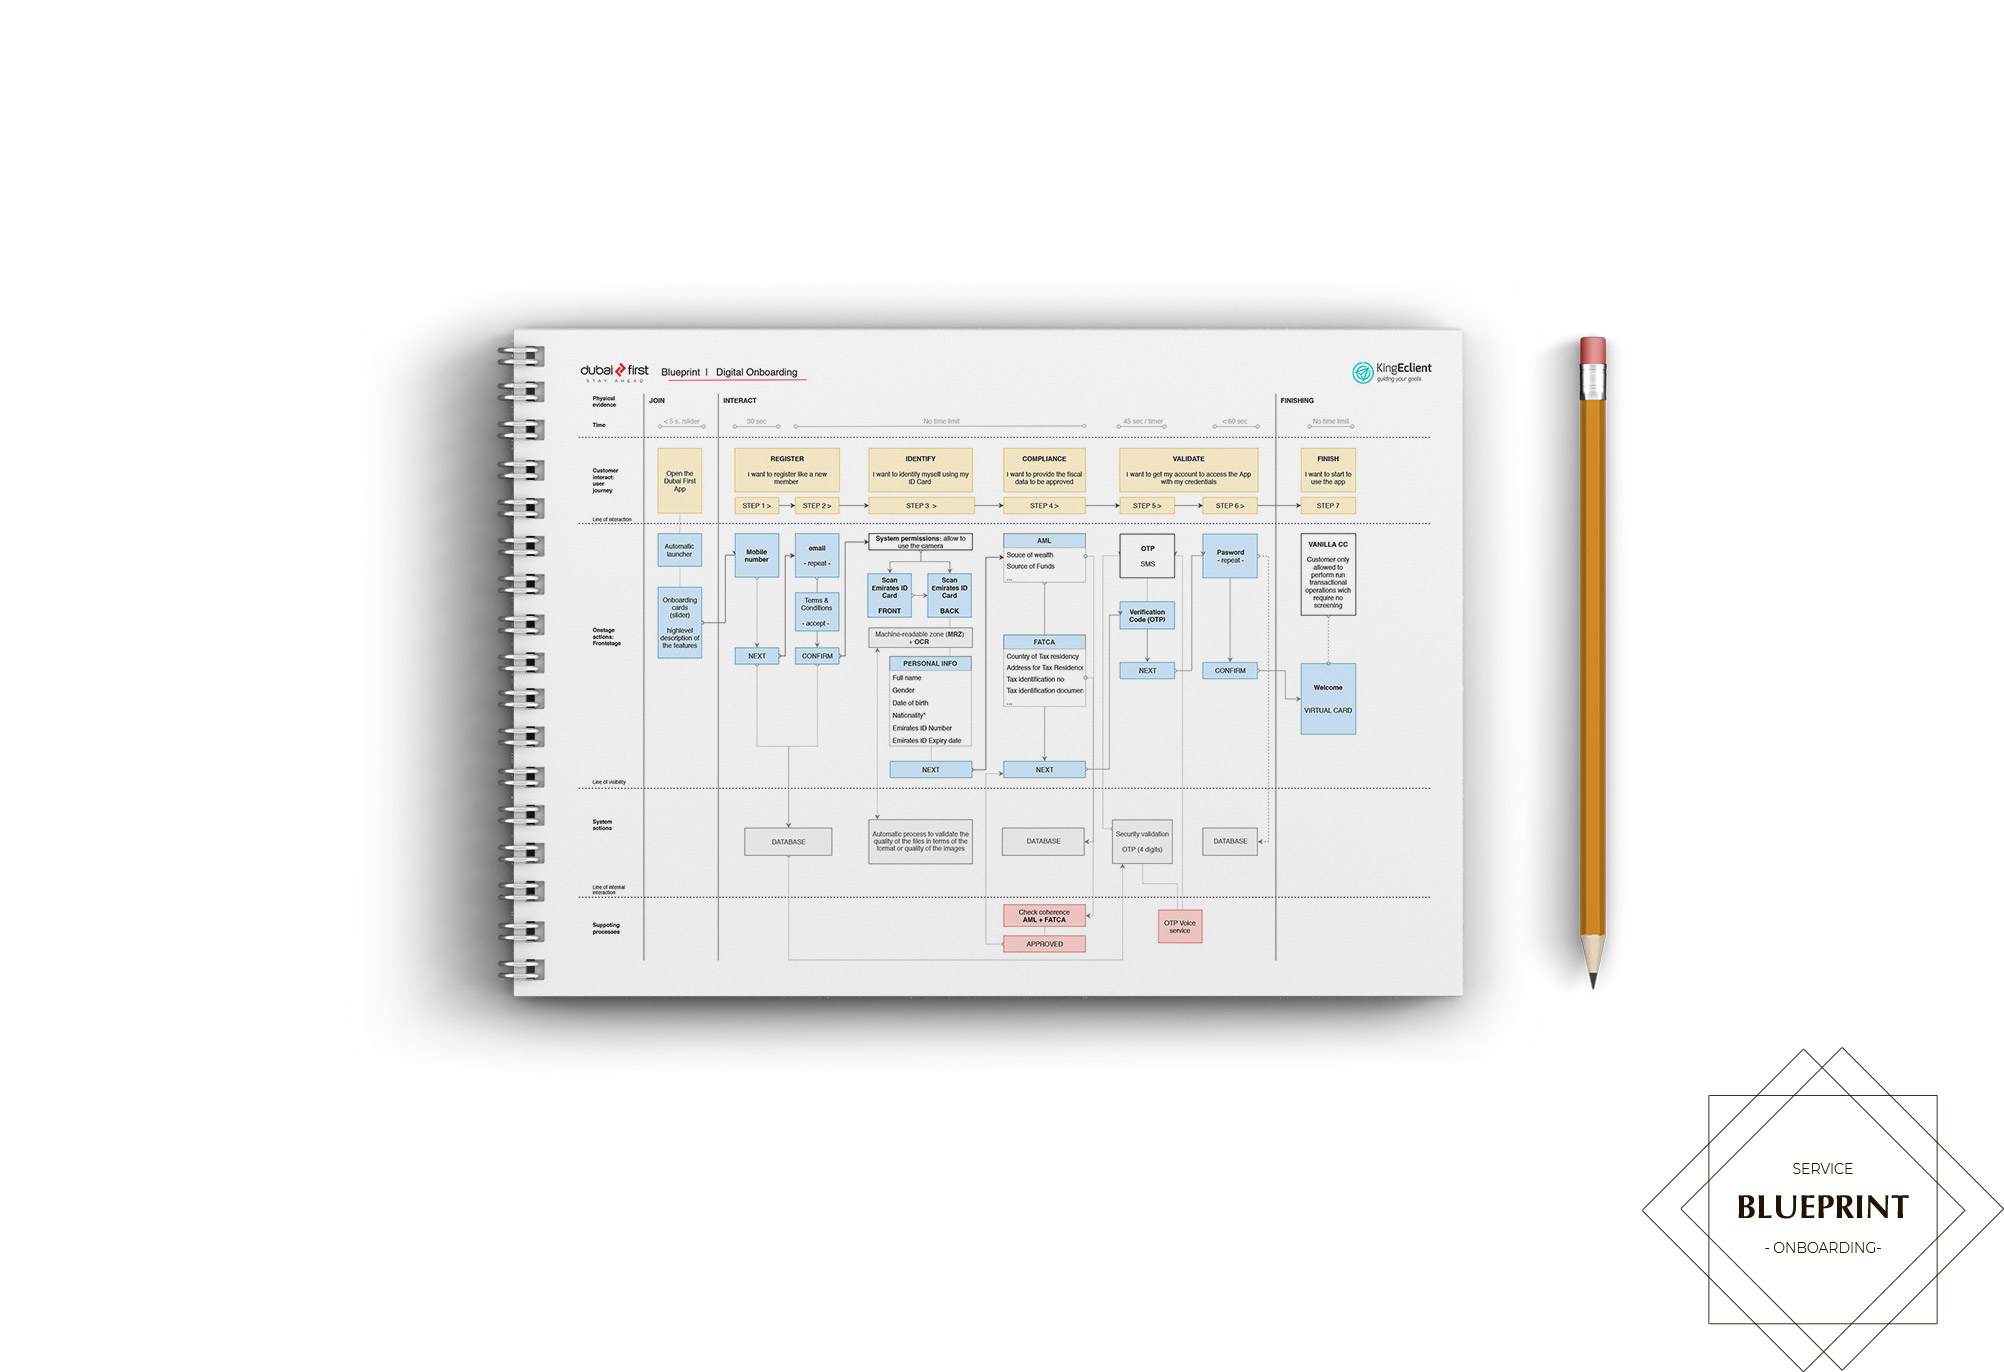 FAB-dubai-first-service-blueprint